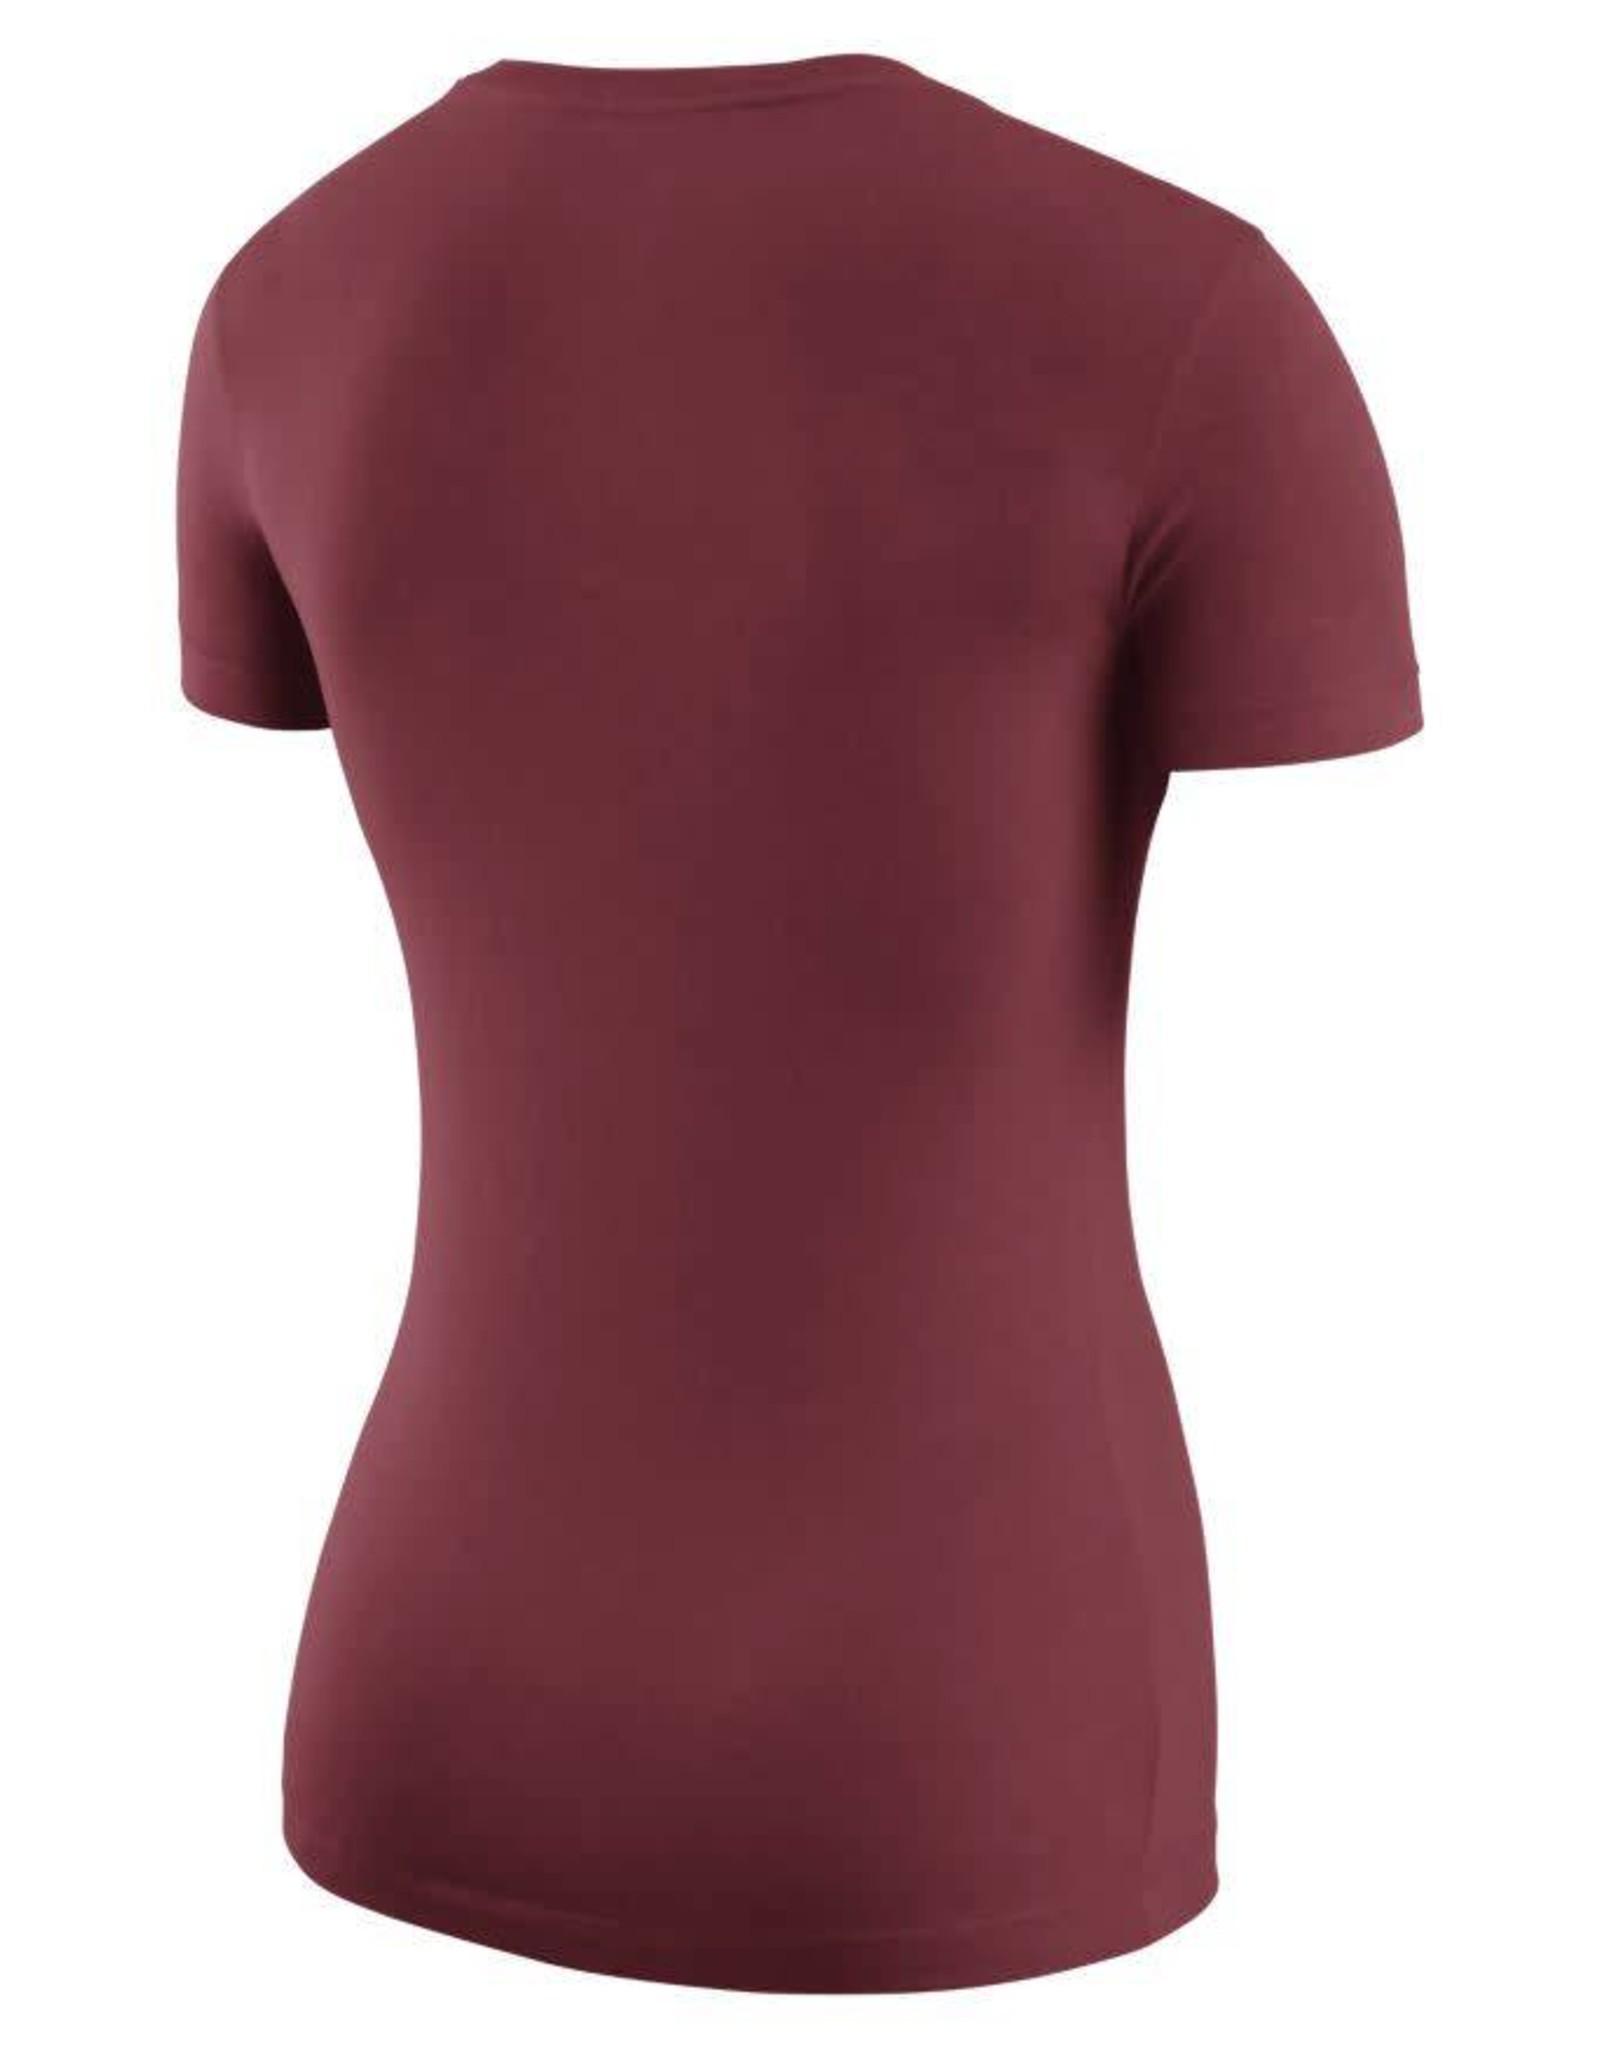 Nike Women's Nike Scoop-Neck Logo Tee Crimson